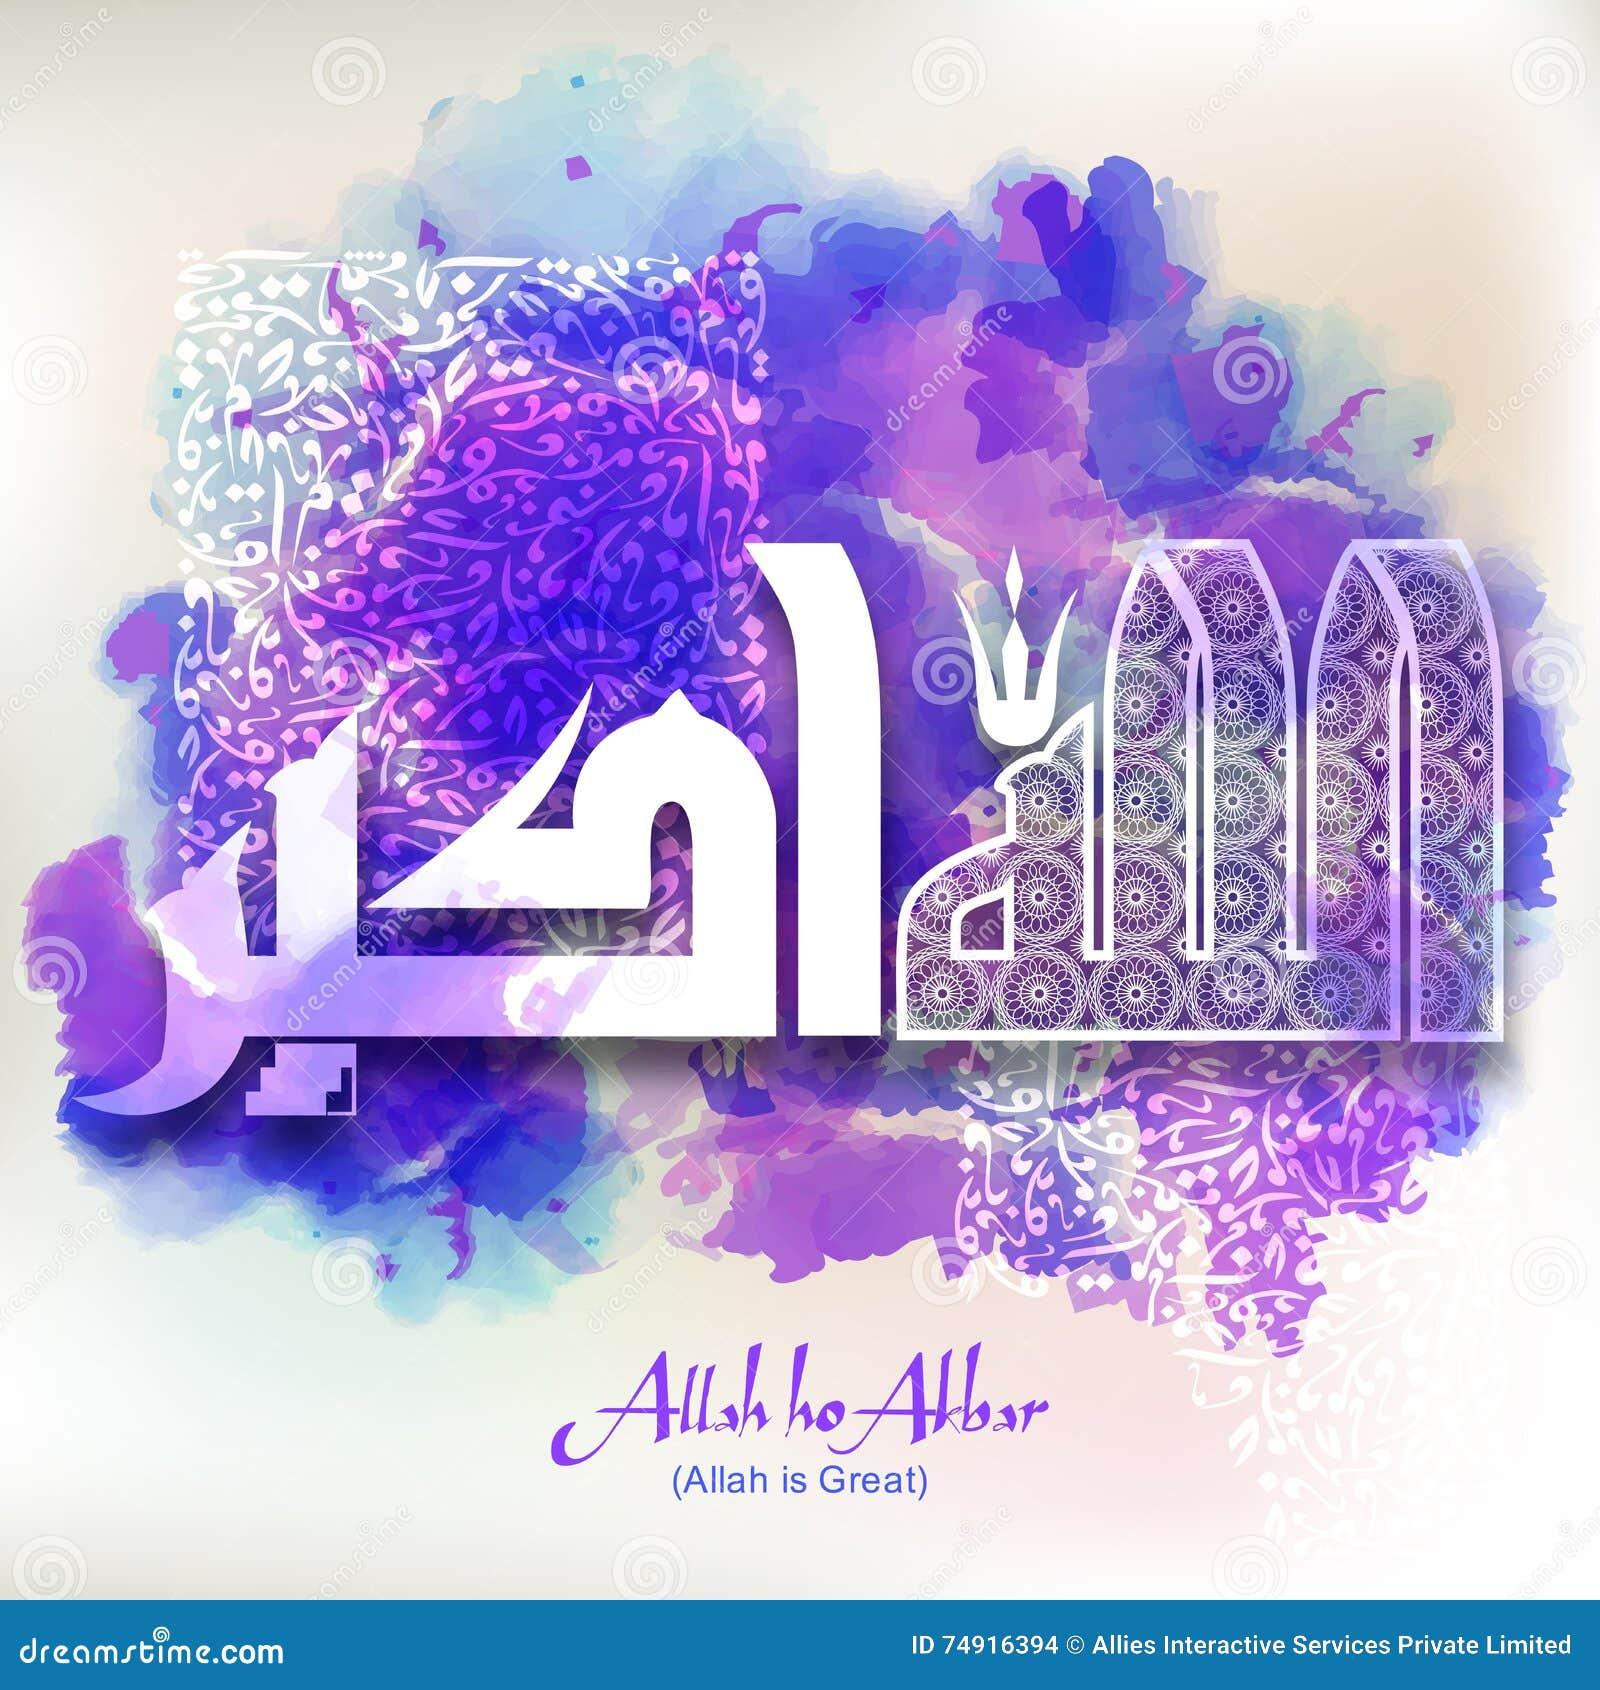 Arabic Calligraphy Of Wish (Dua) For Islamic Festivals